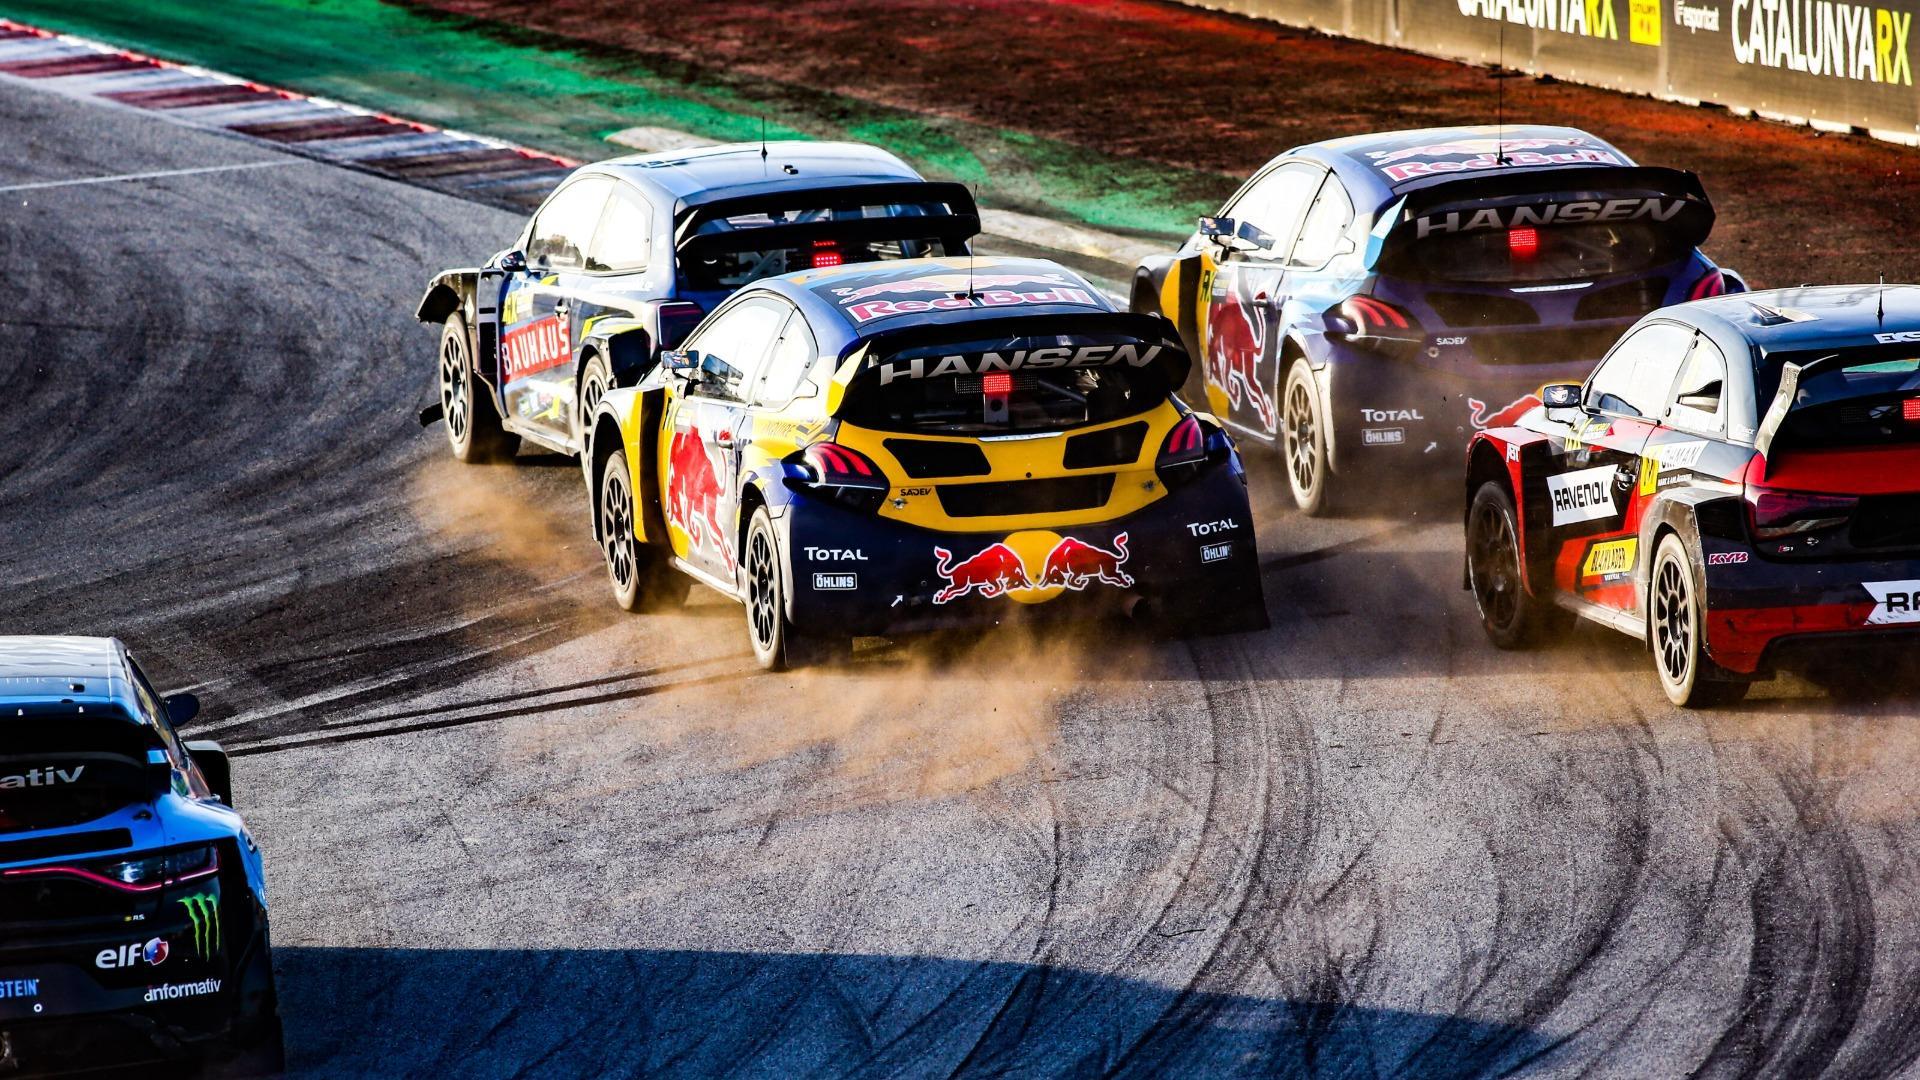 World RX of Catalunya 2021: Event Teaser